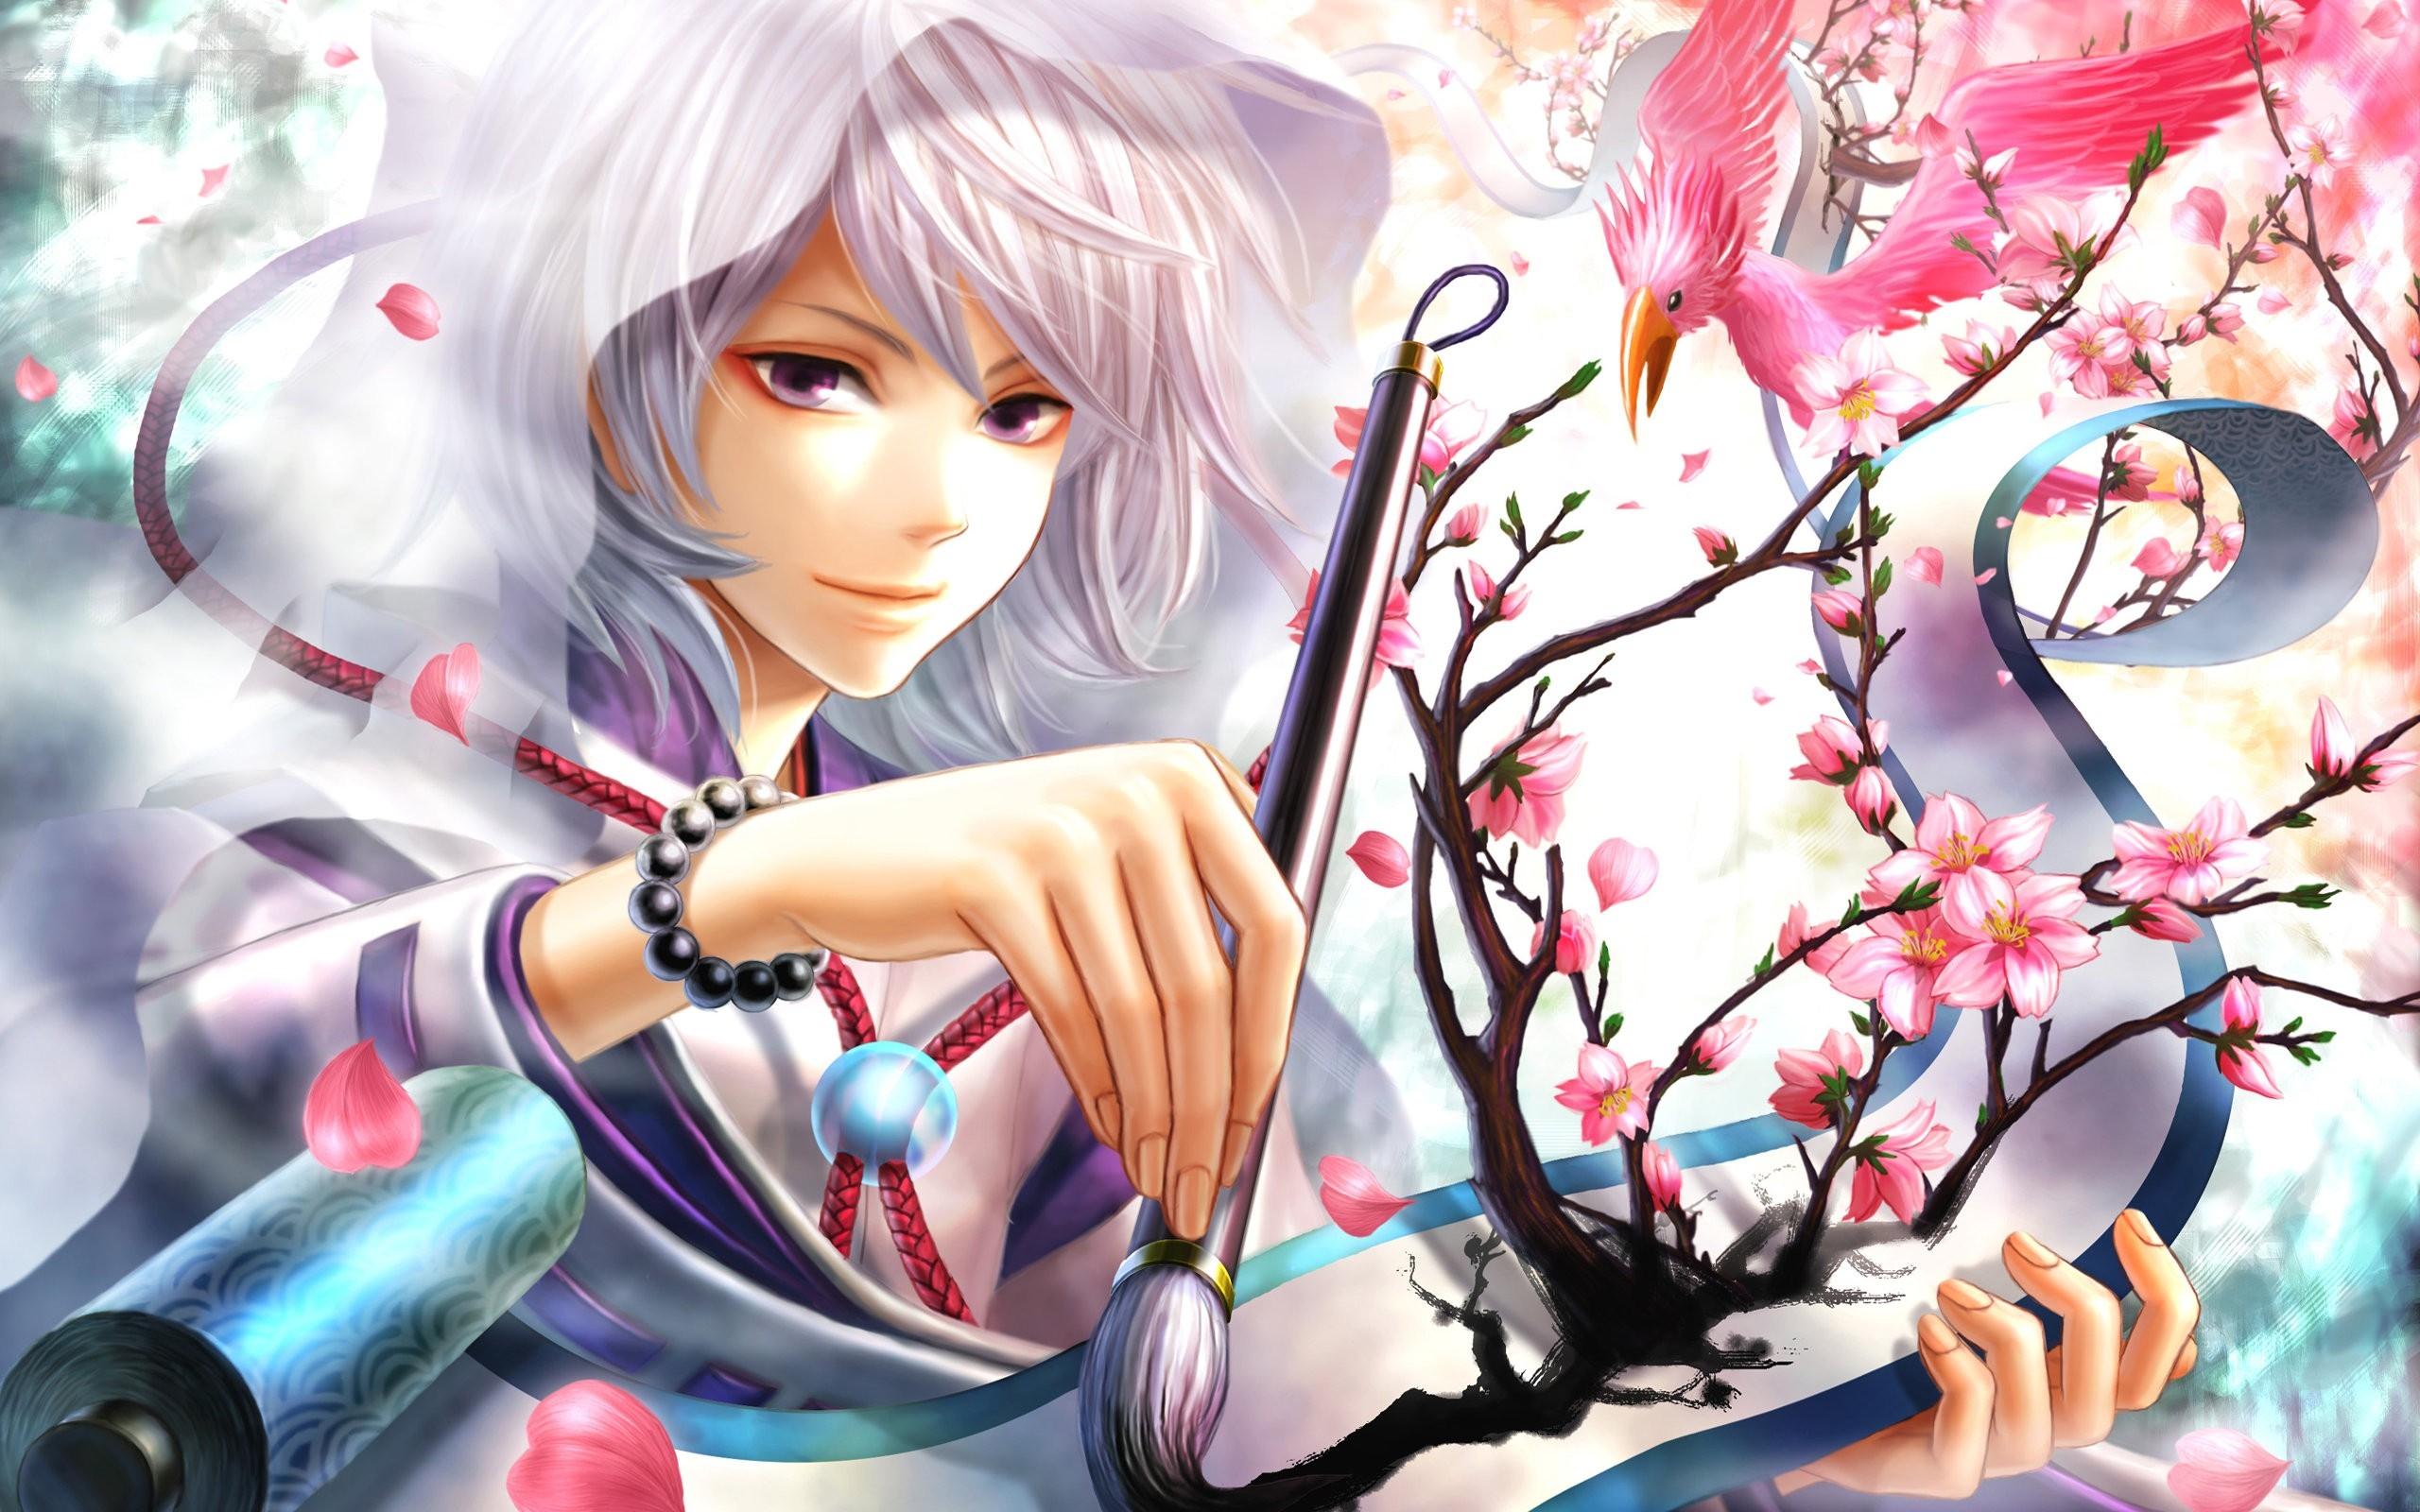 Beautiful Wallpaper Naruto Hood - anime-girl-hood-brush-painting-drawing-ART-746930  Picture_631615.jpg